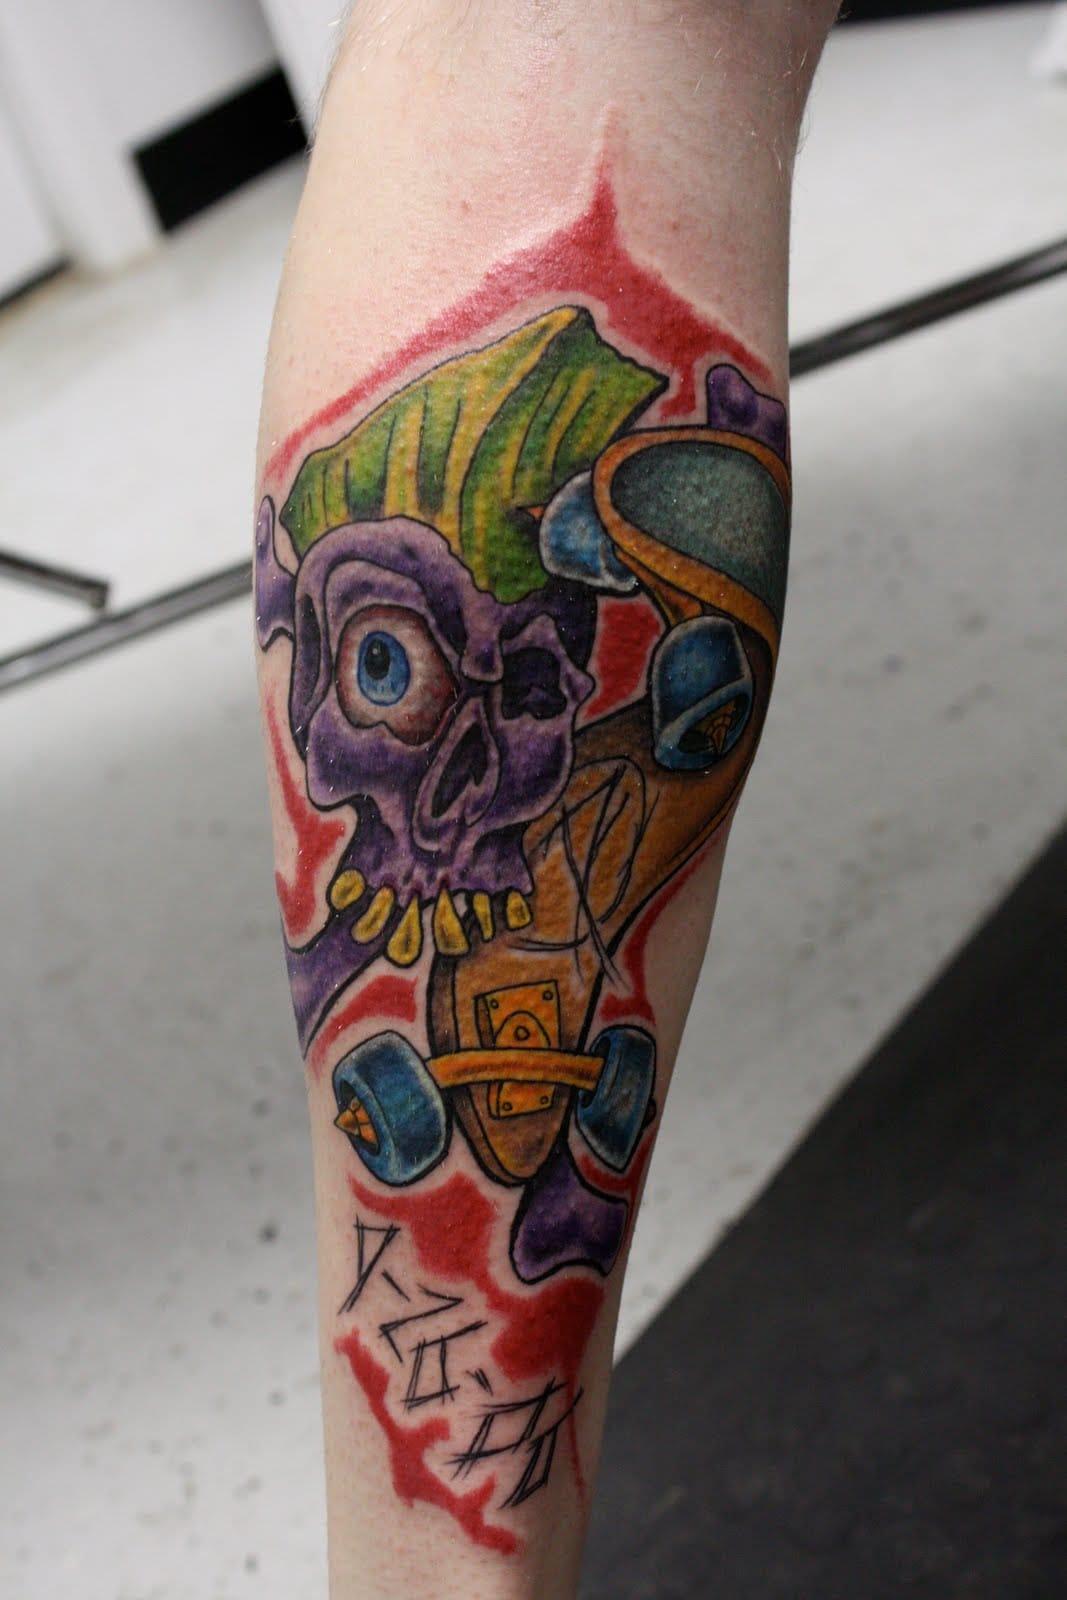 Estilo New School feito no Brass Knucles Grenade Tattoo